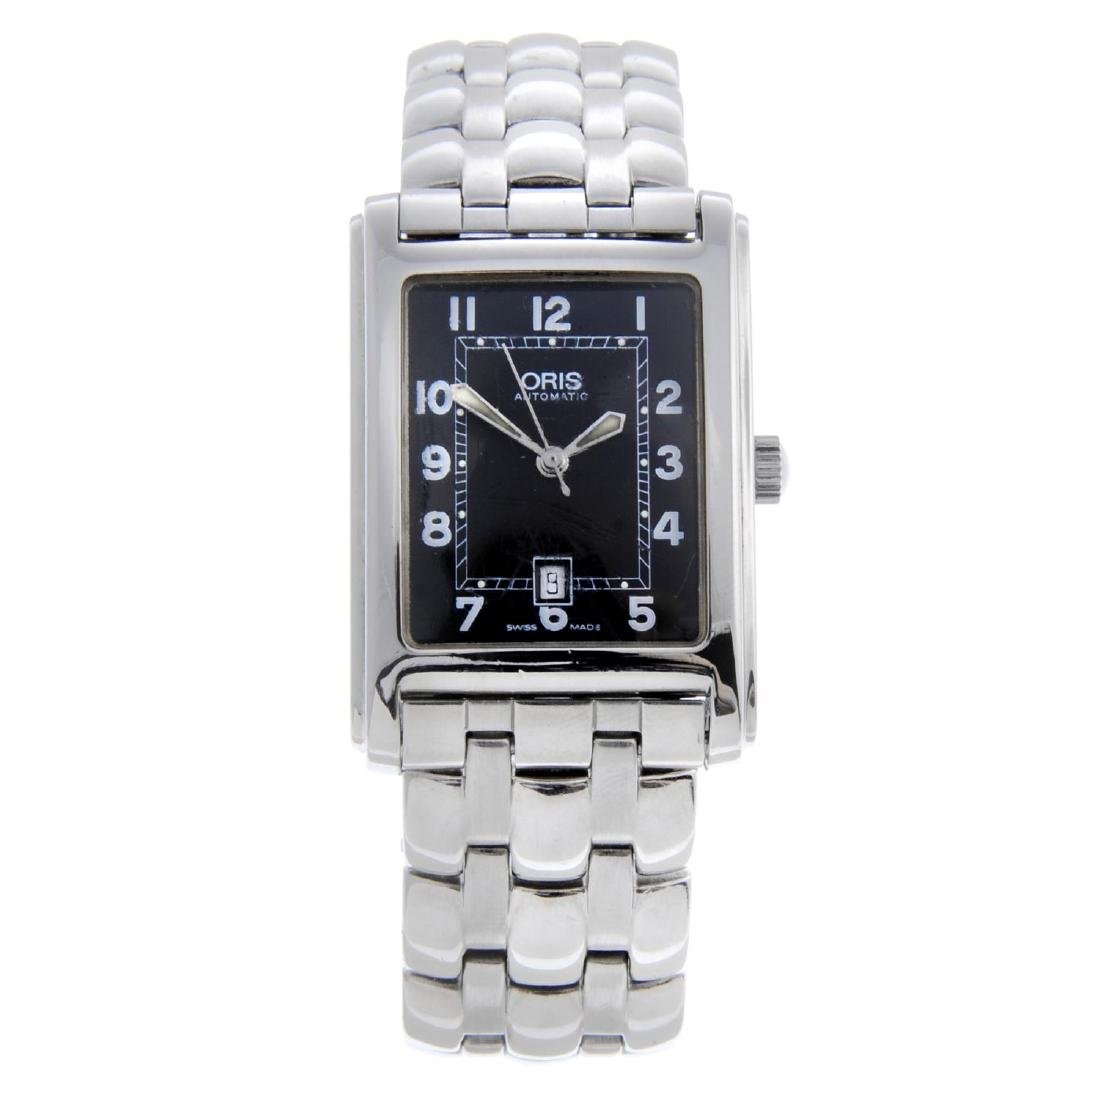 ORIS - a gentleman's Classic bracelet watch. Stainless